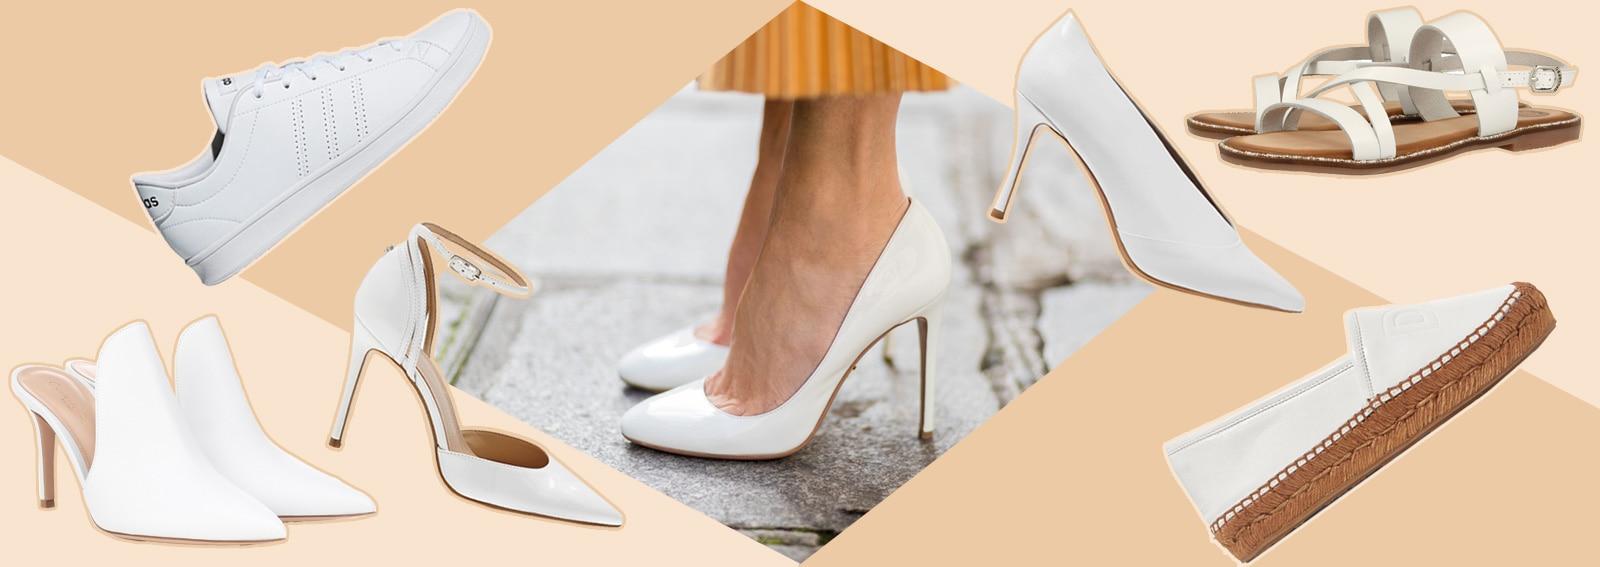 DESKTOP_scarpe_bianche